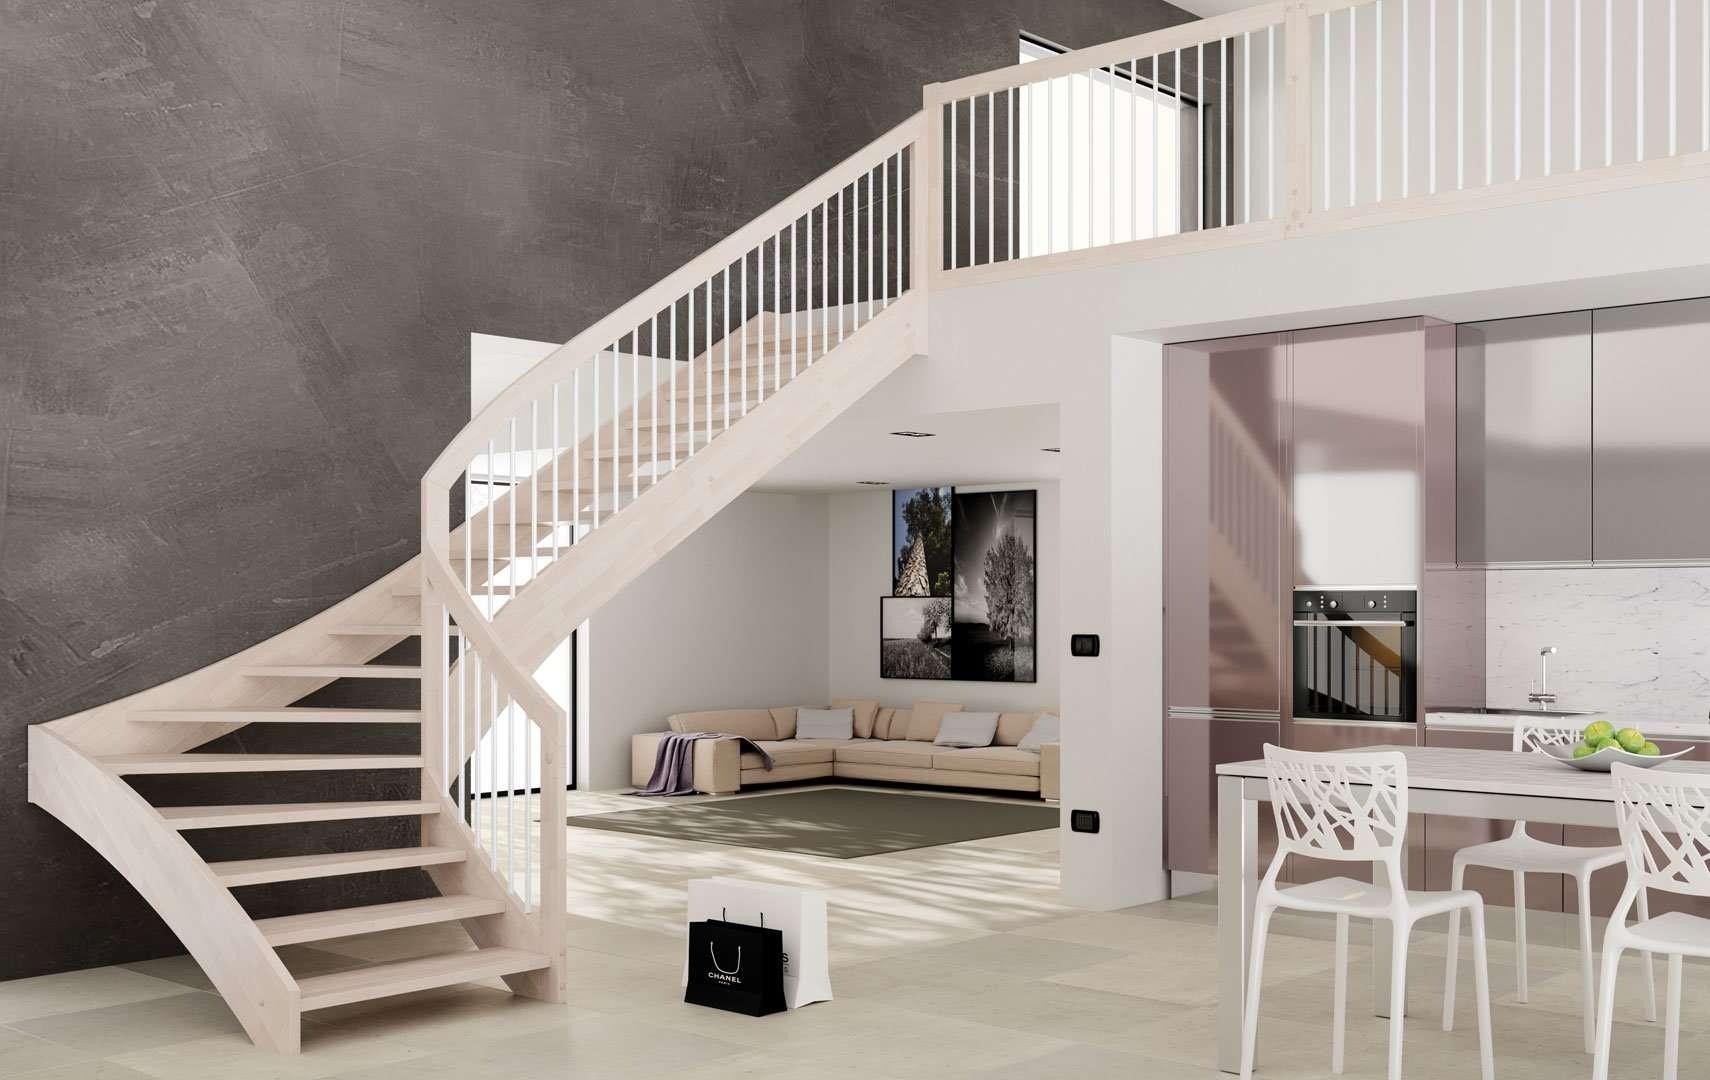 Esperia scale interne moderne in legno scegli i modelli pi apprezzati dai nostri clienti - Scale interne classiche ...